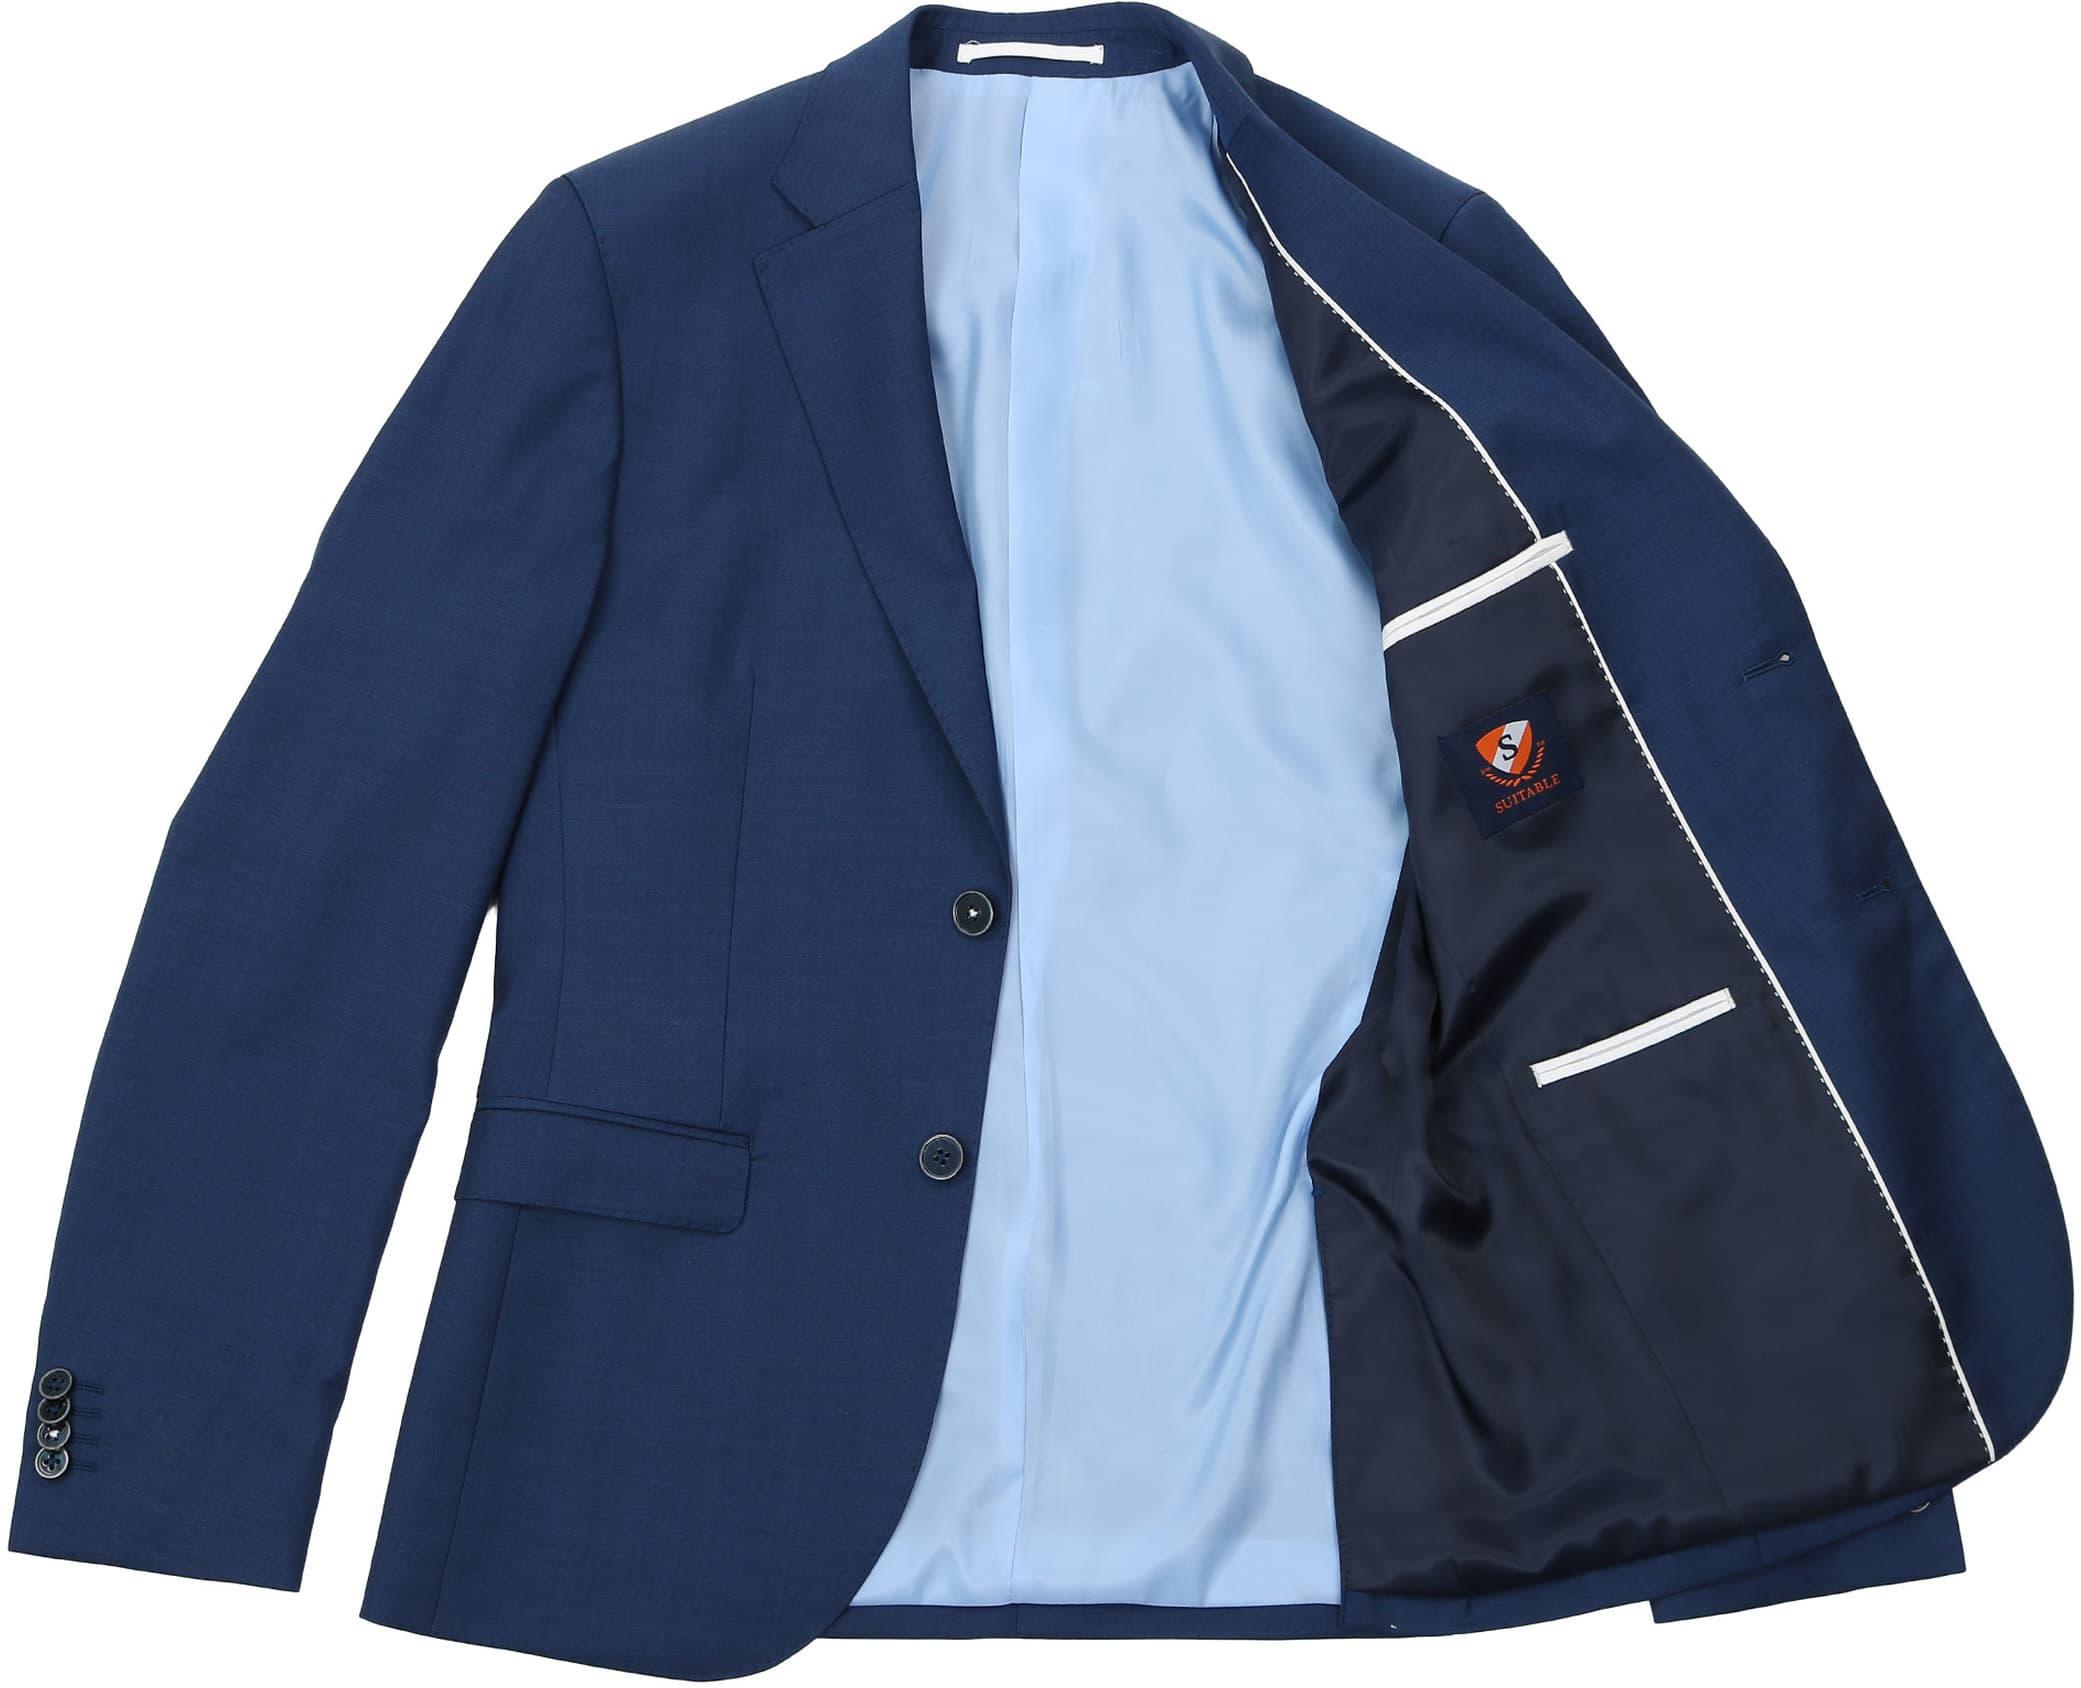 Suitable Anzug Strato Hellblau Navy foto 5